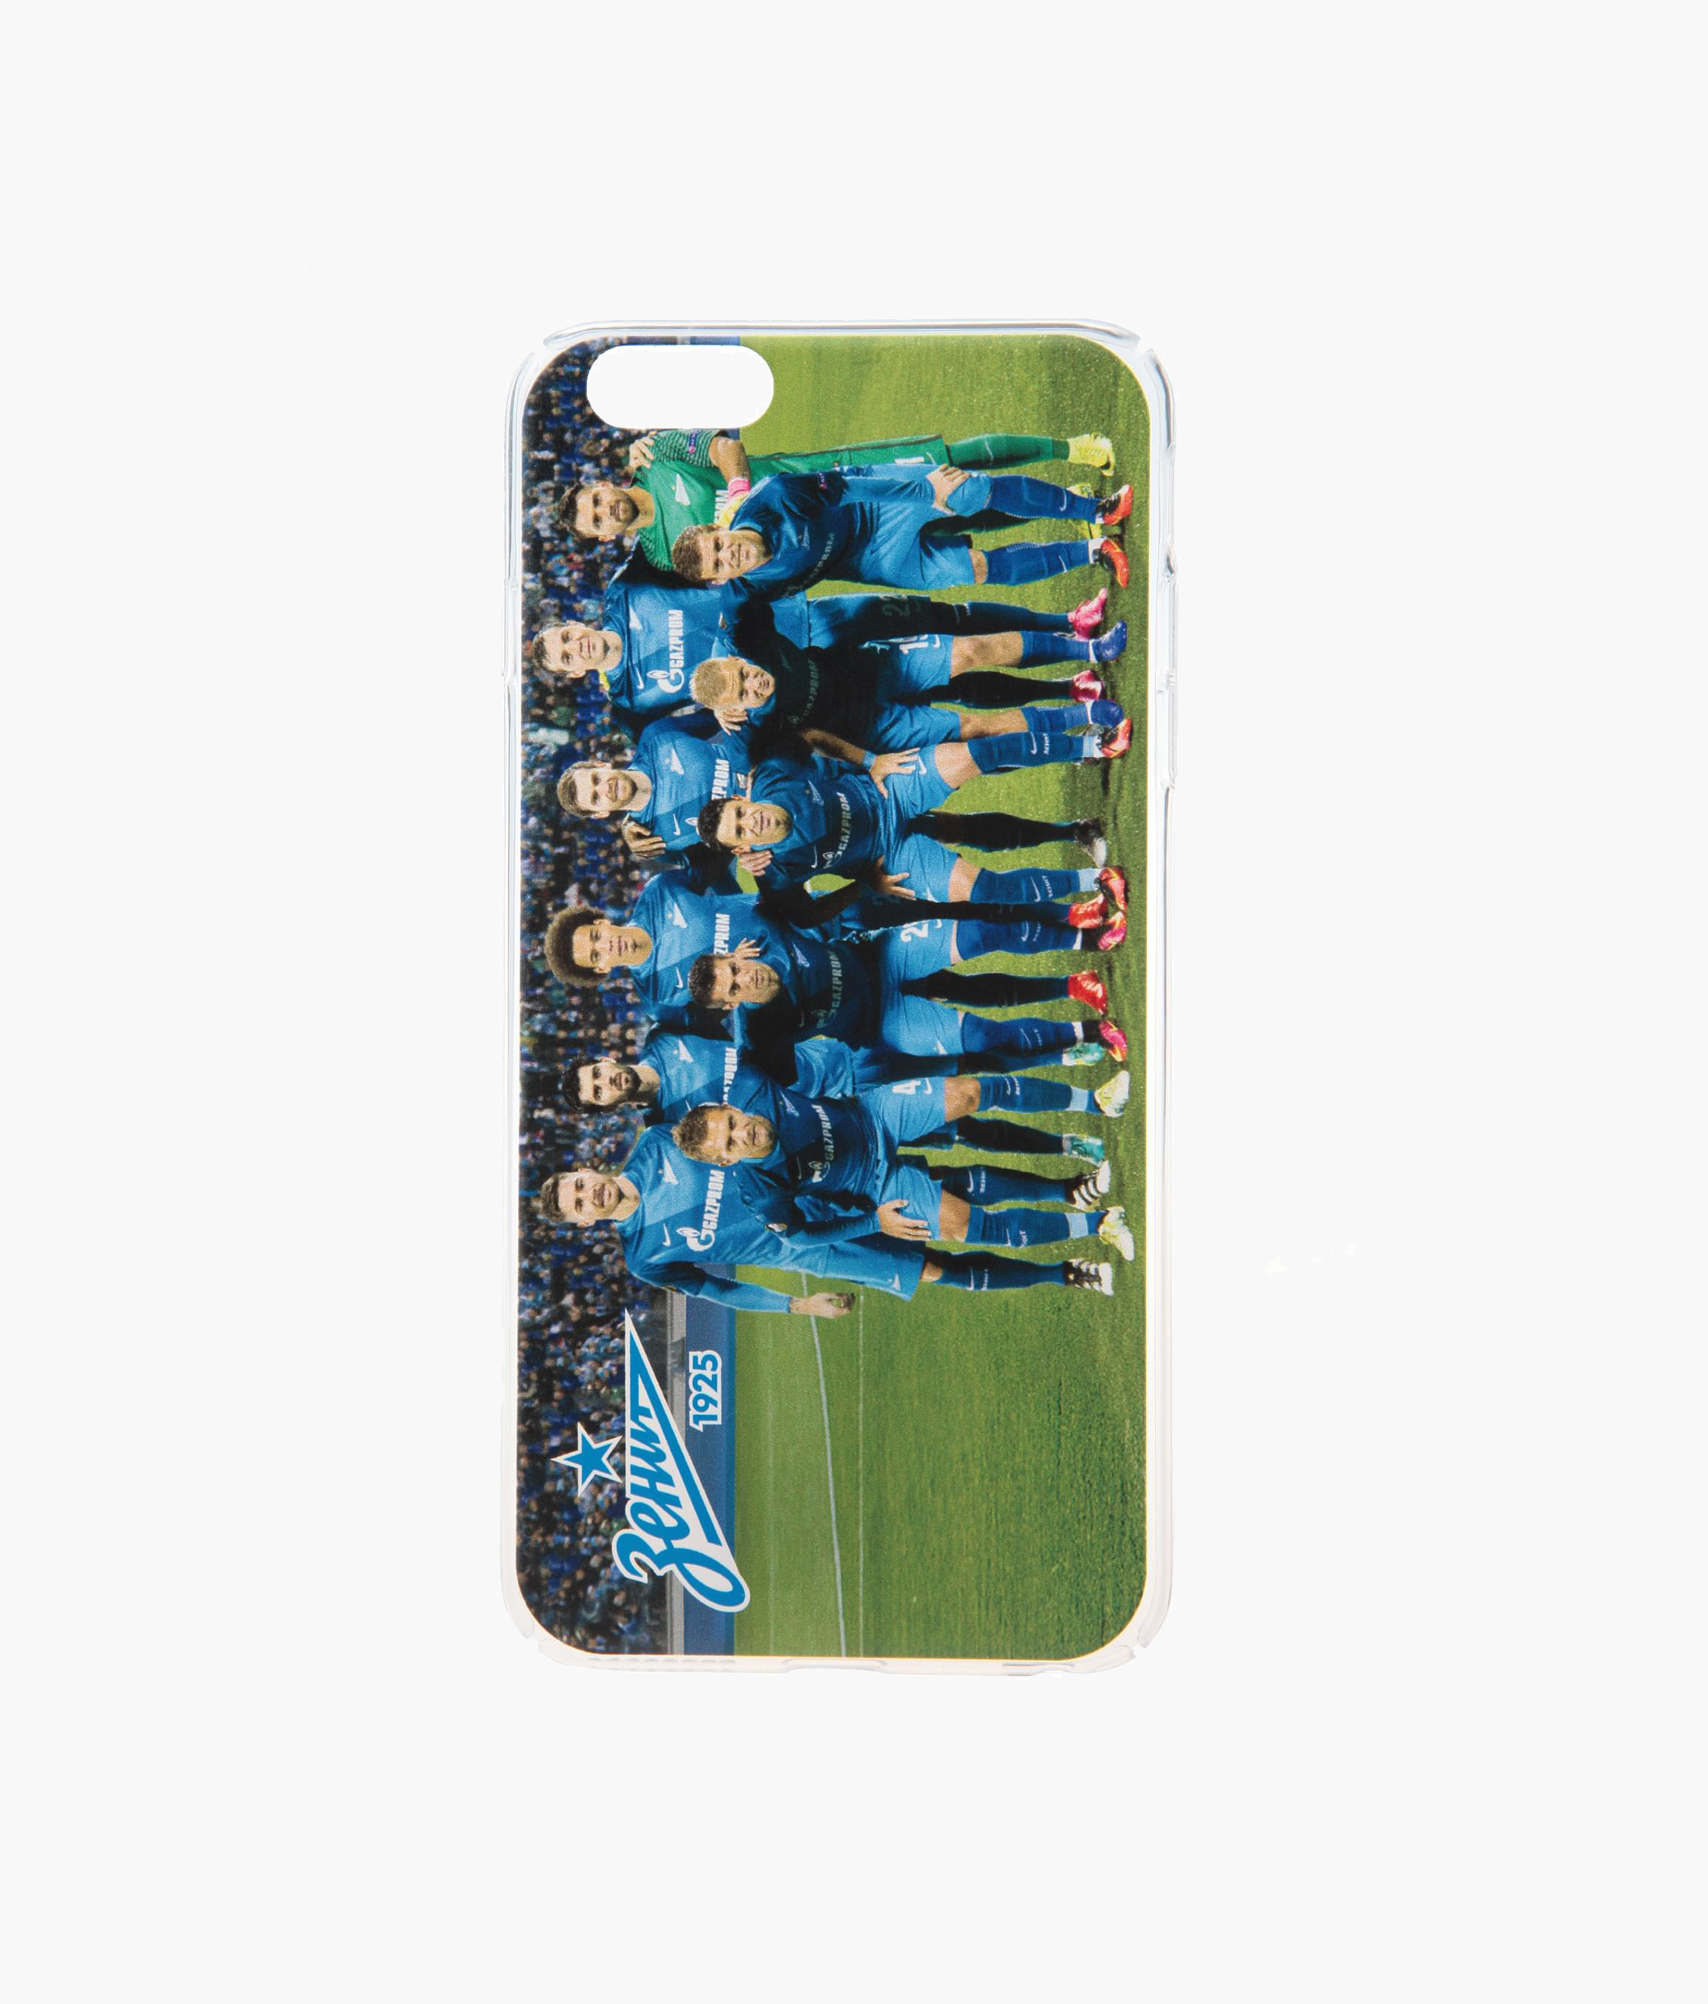 Фото - Чехол для IPhone 6/6S Plus «Команда 2016/17» Зенит чехол накладка для apple iphone 6 6s deppa gel plus case 85213 pink клип кейс полиуретан